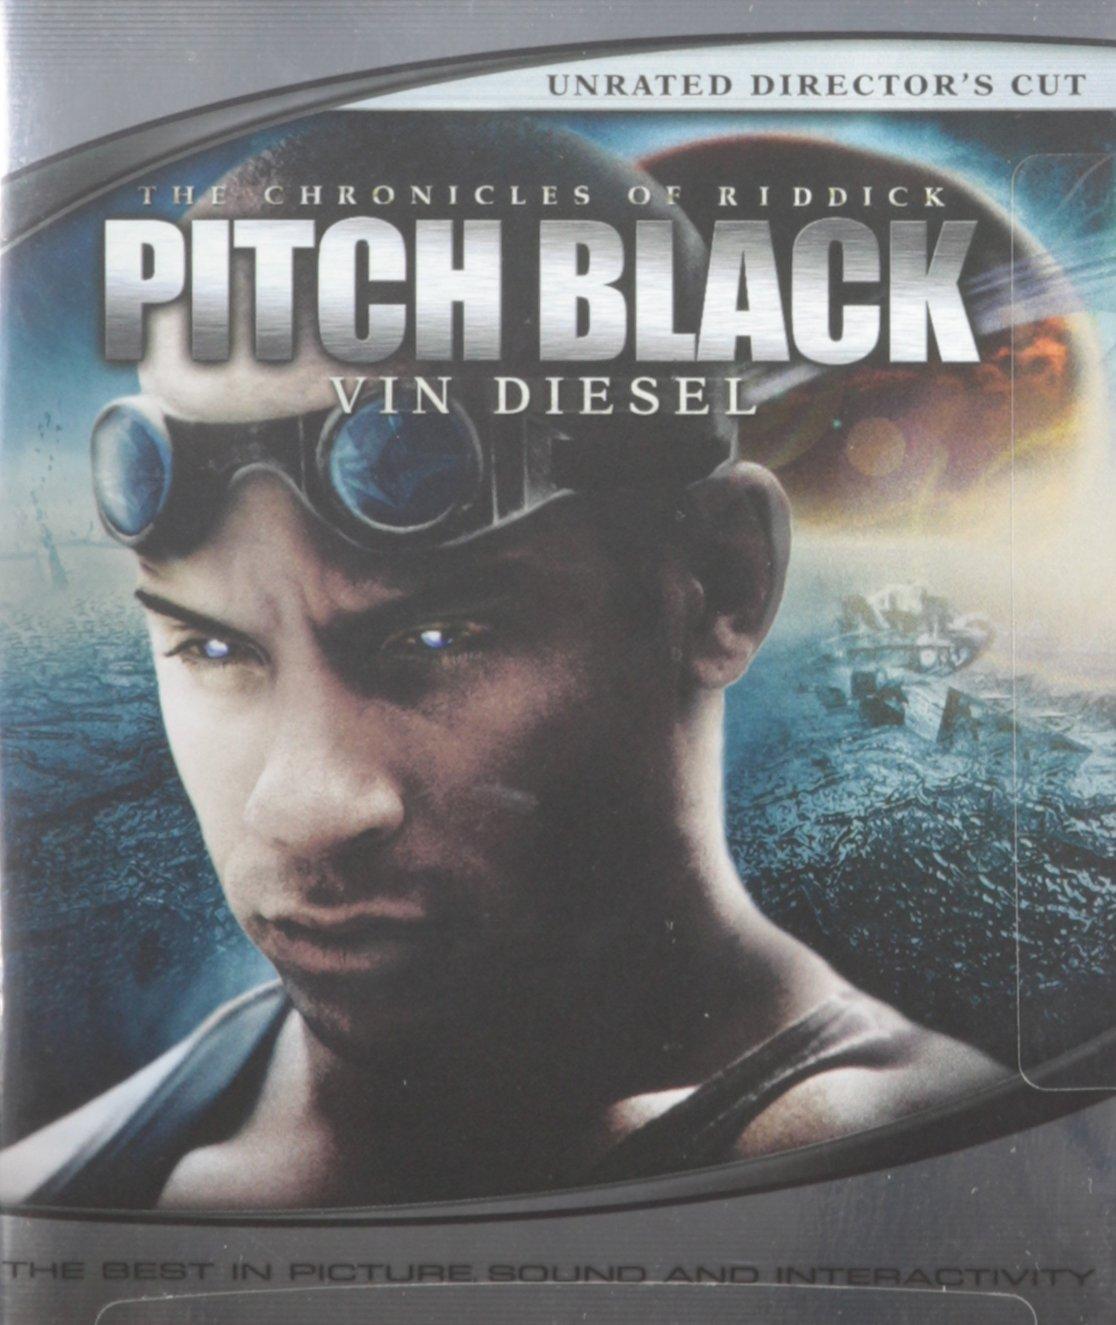 Amazon.com: The Chronicles of Riddick - Pitch Black (Unrated Director's  Cut) [HD DVD]: Vin Diesel, Radha Mitchell, Keith David, Rhiana Griffith,  Cole Hauser, Claudia Black, David Twohy, Tom Engelman, Jim Wheat, Ken